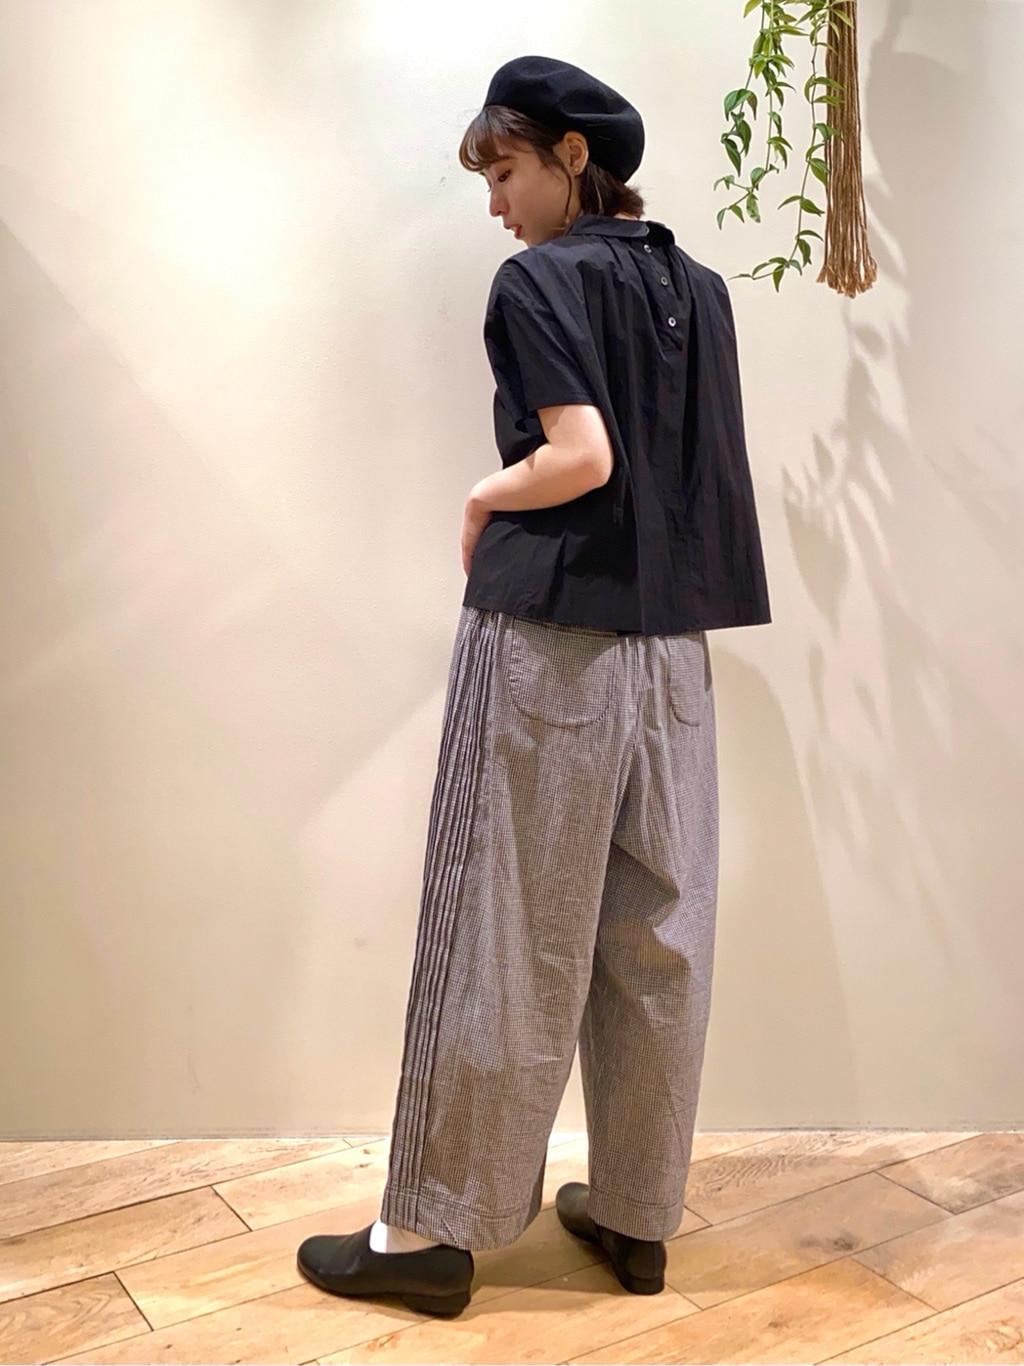 bulle de savon 新宿ミロード 身長:157cm 2021.04.16